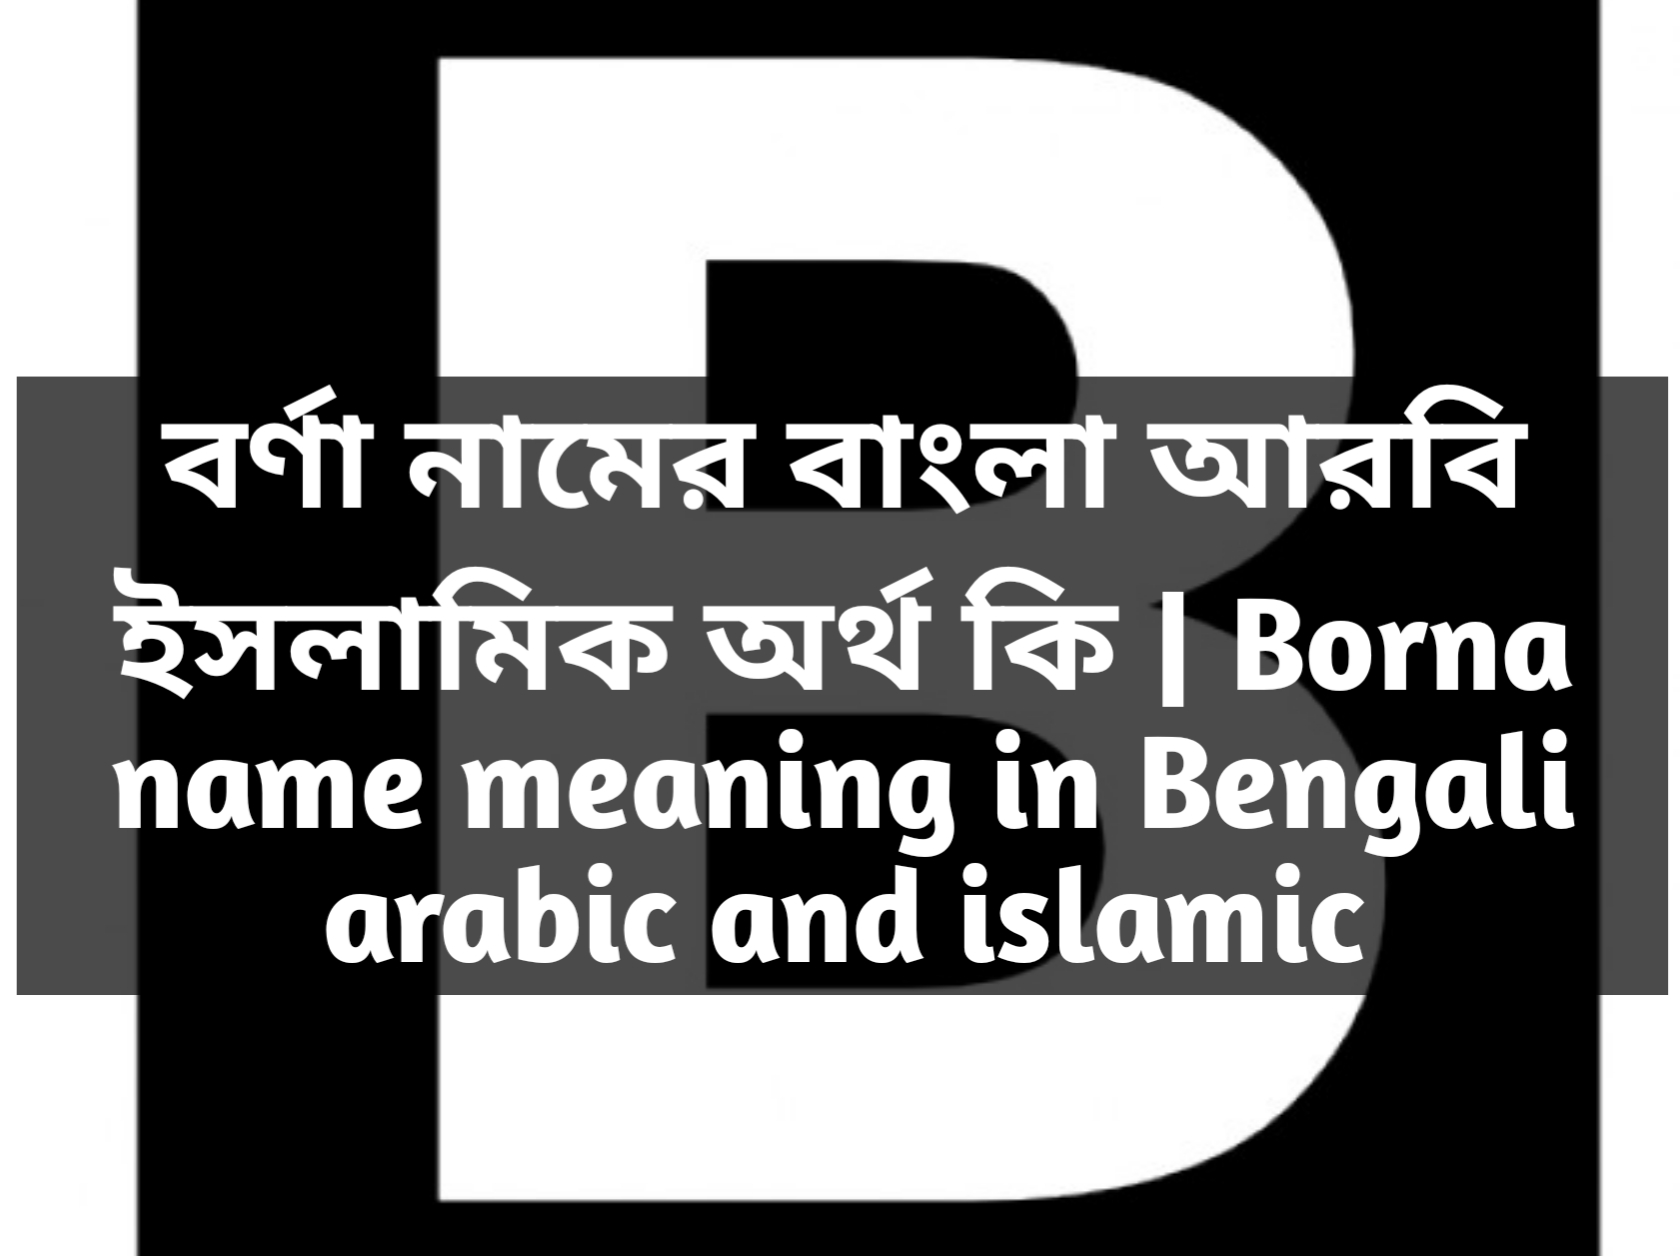 Borna name meaning in Bengali, বর্ণা নামের অর্থ কি, বর্ণা নামের বাংলা অর্থ কি, বর্ণা নামের ইসলামিক অর্থ কি,